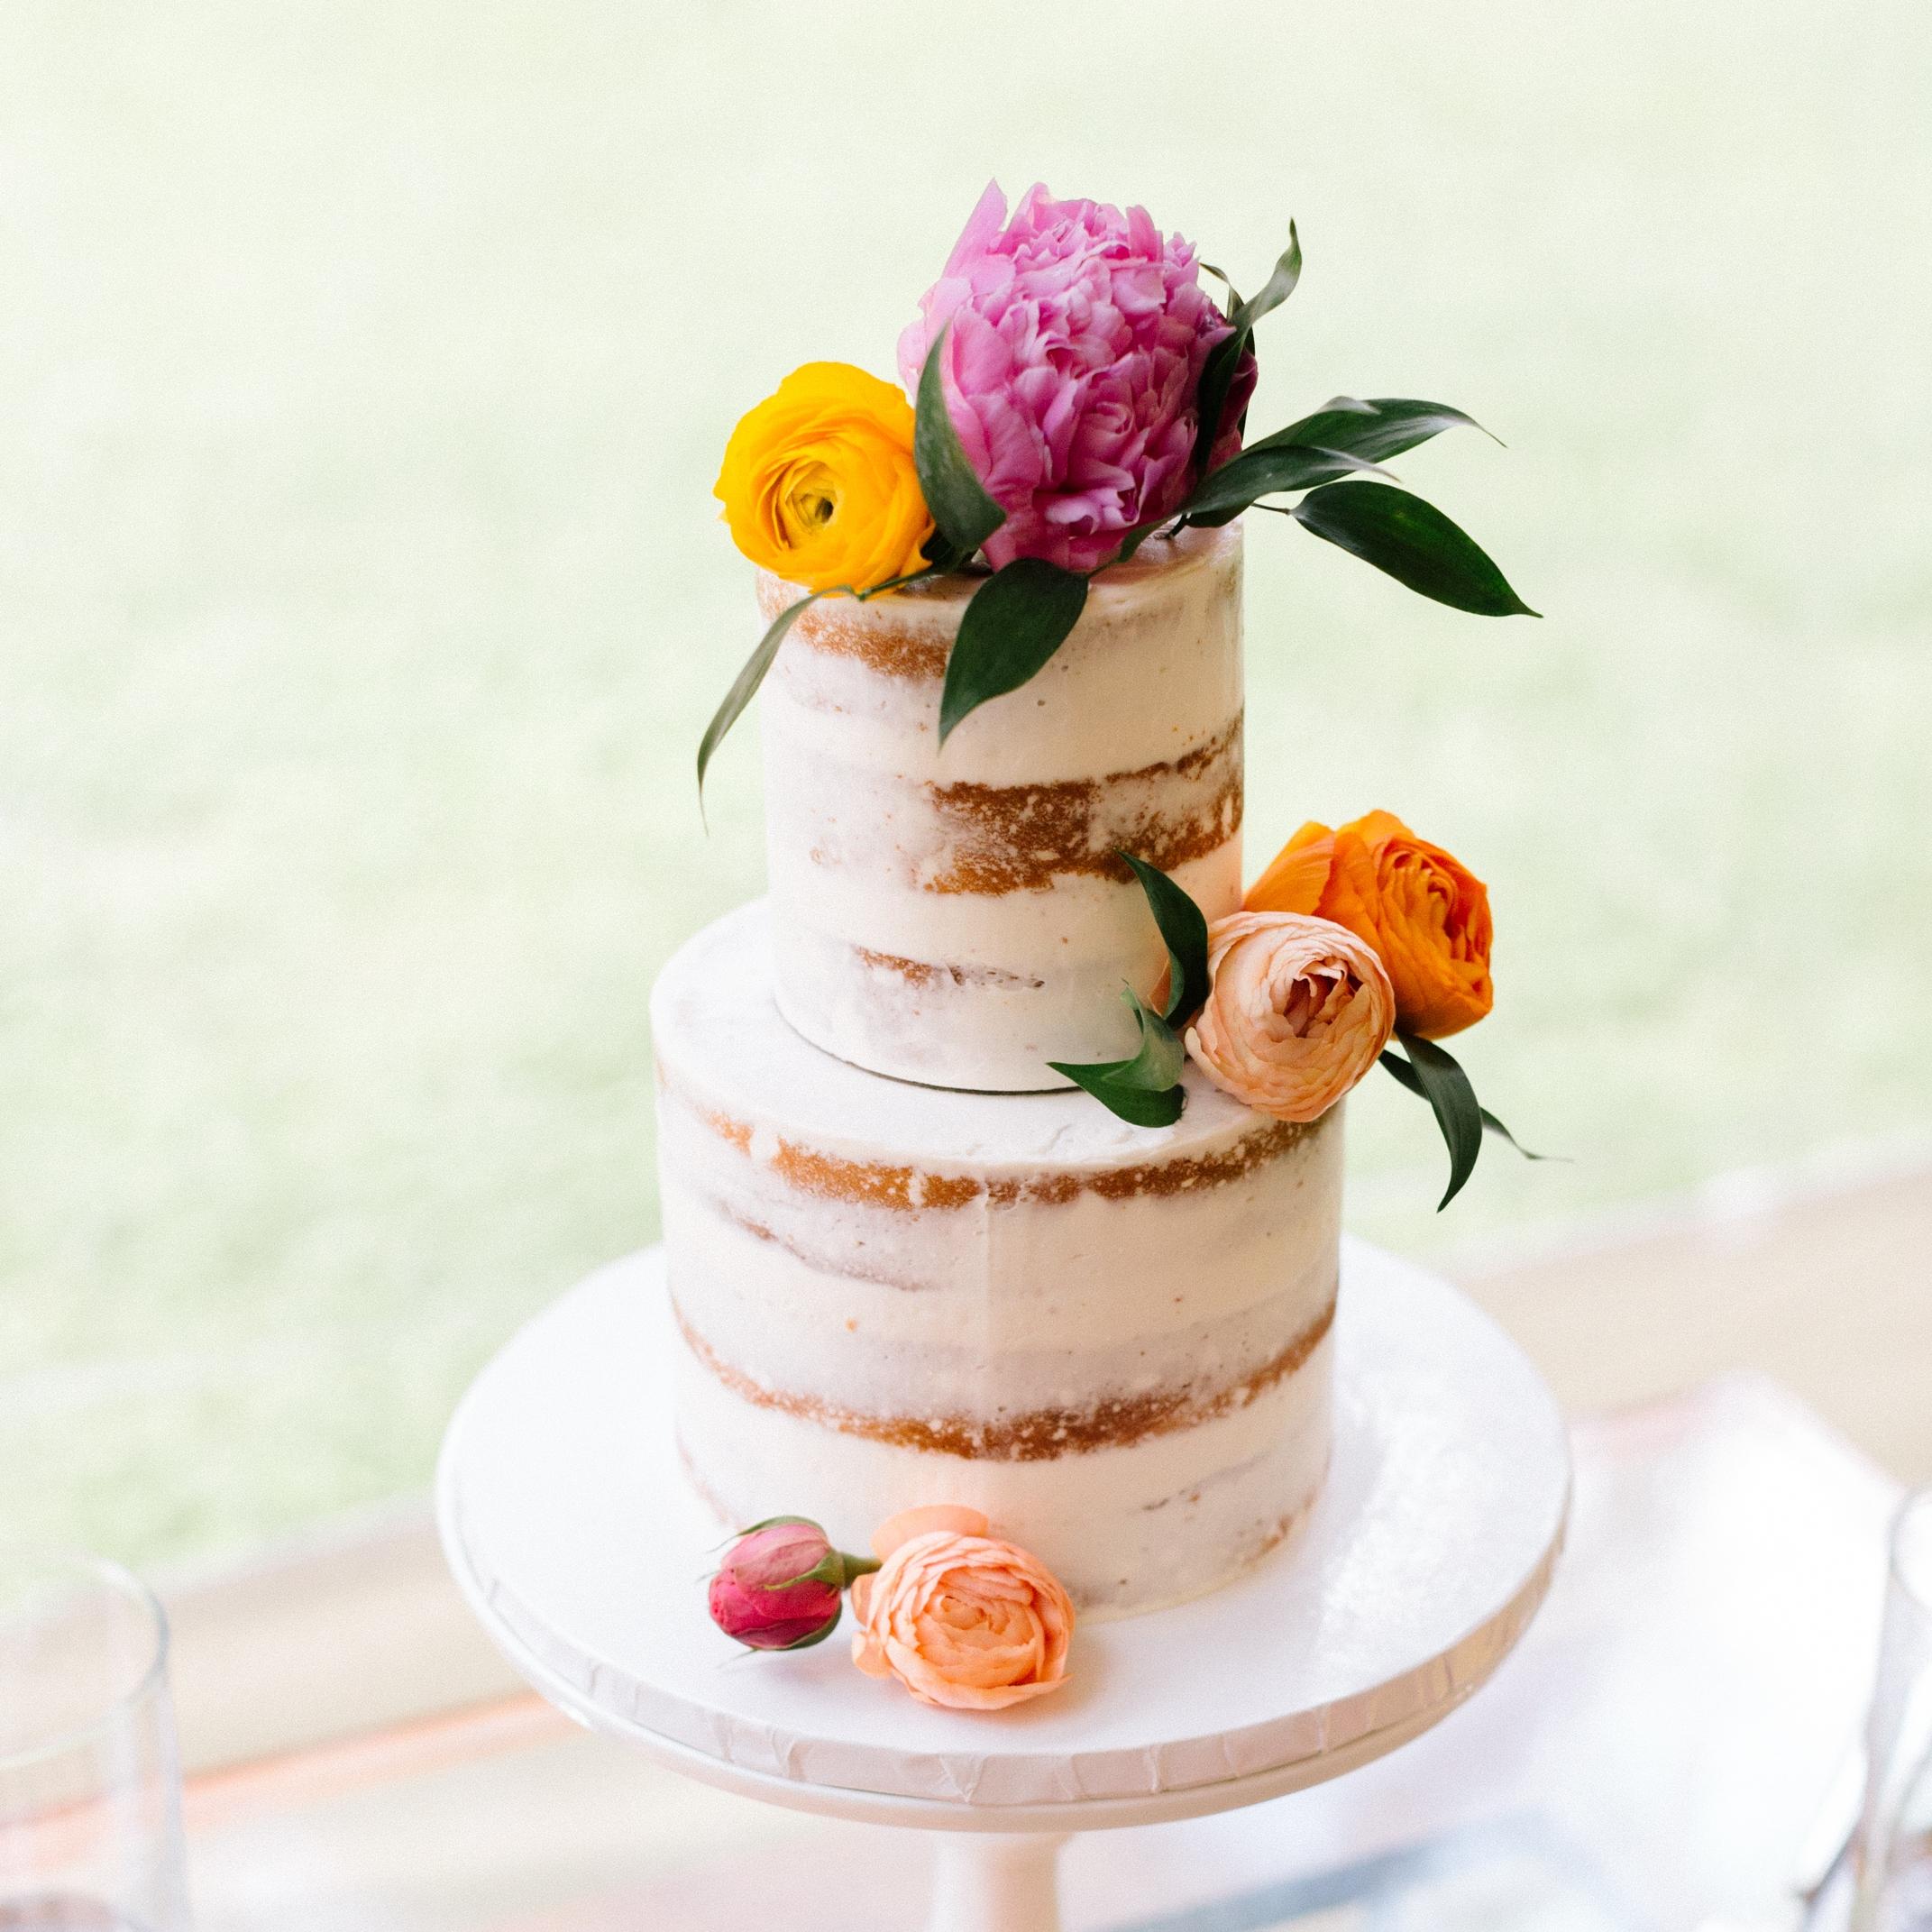 Candy Valley Cake Co. - $$-$$$Richmond, VAPHOTO | Stephanie Yonce Photography